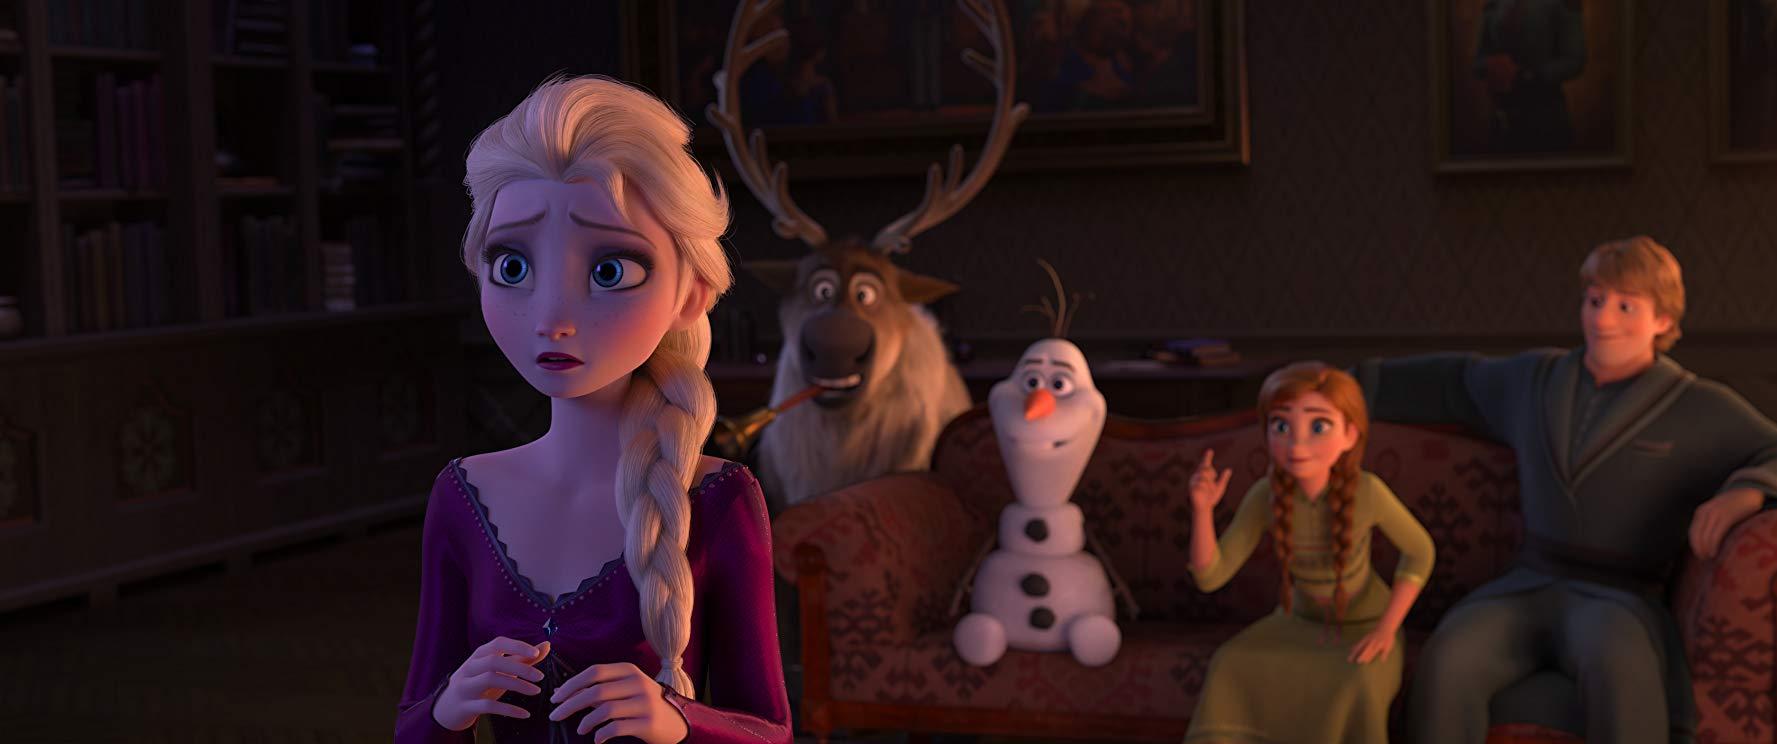 Frozen 2 supervising animator Justin Sklar on the film's craziest scene